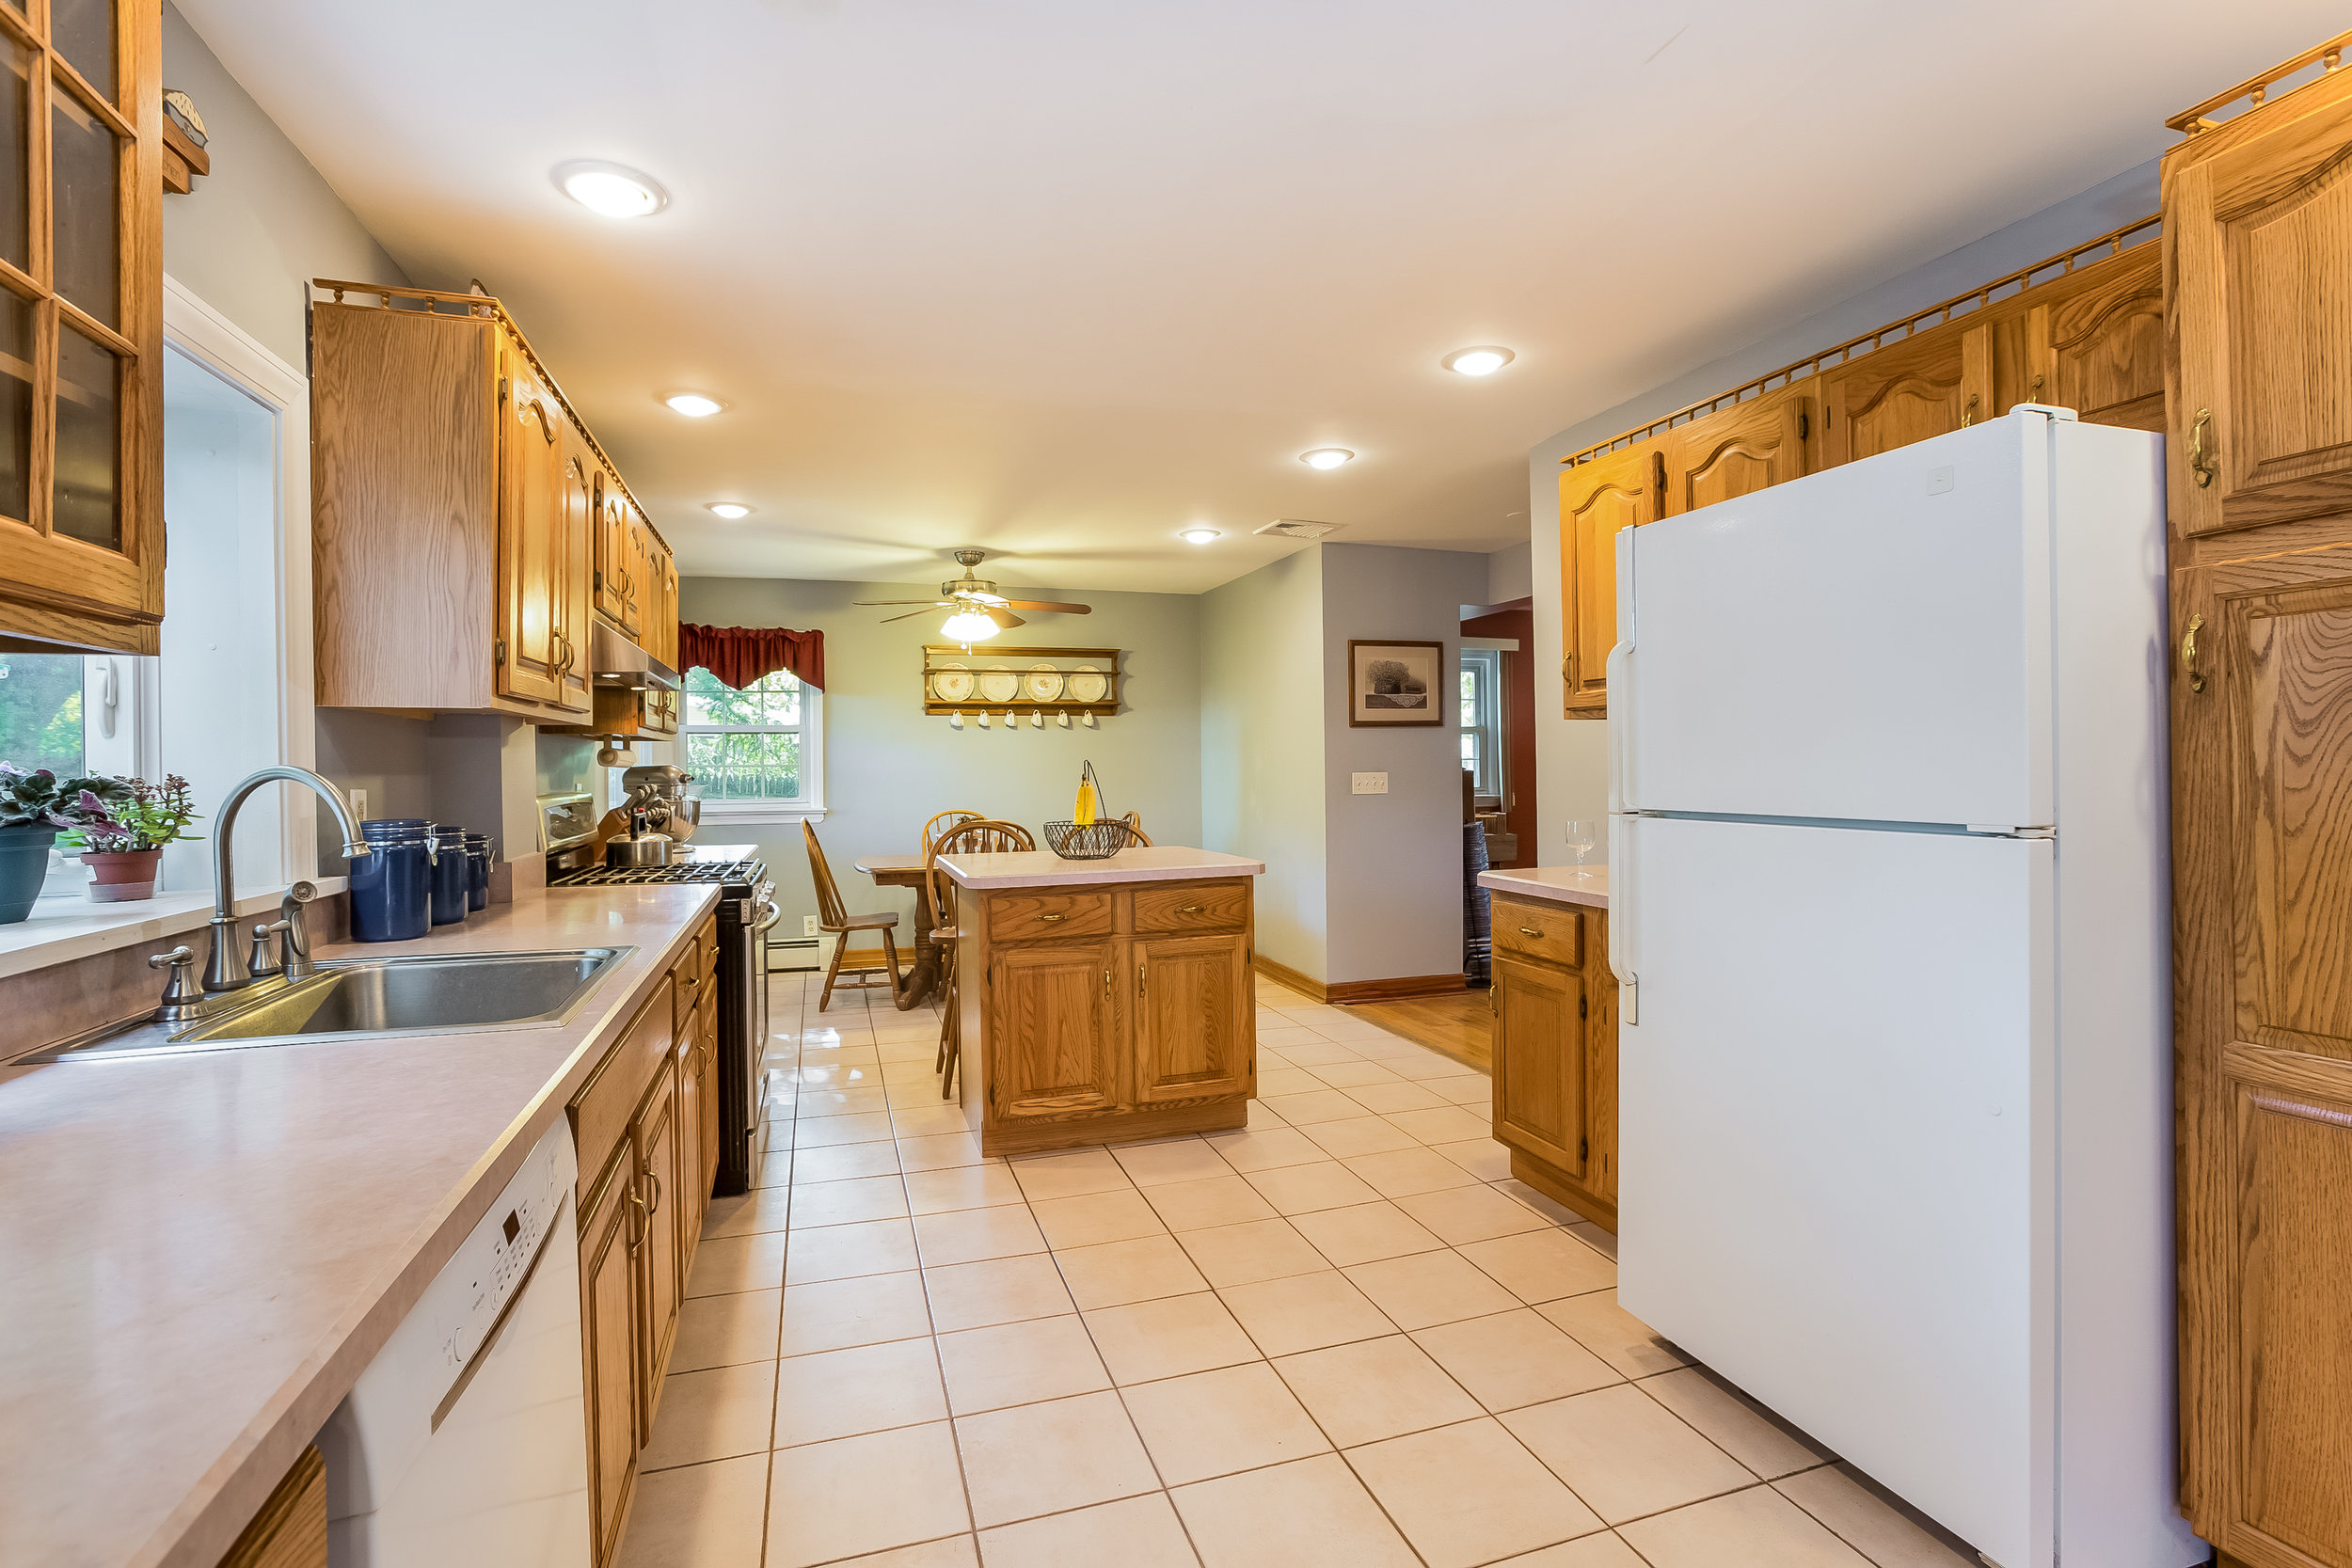 017-Kitchen-5002144-large.jpg